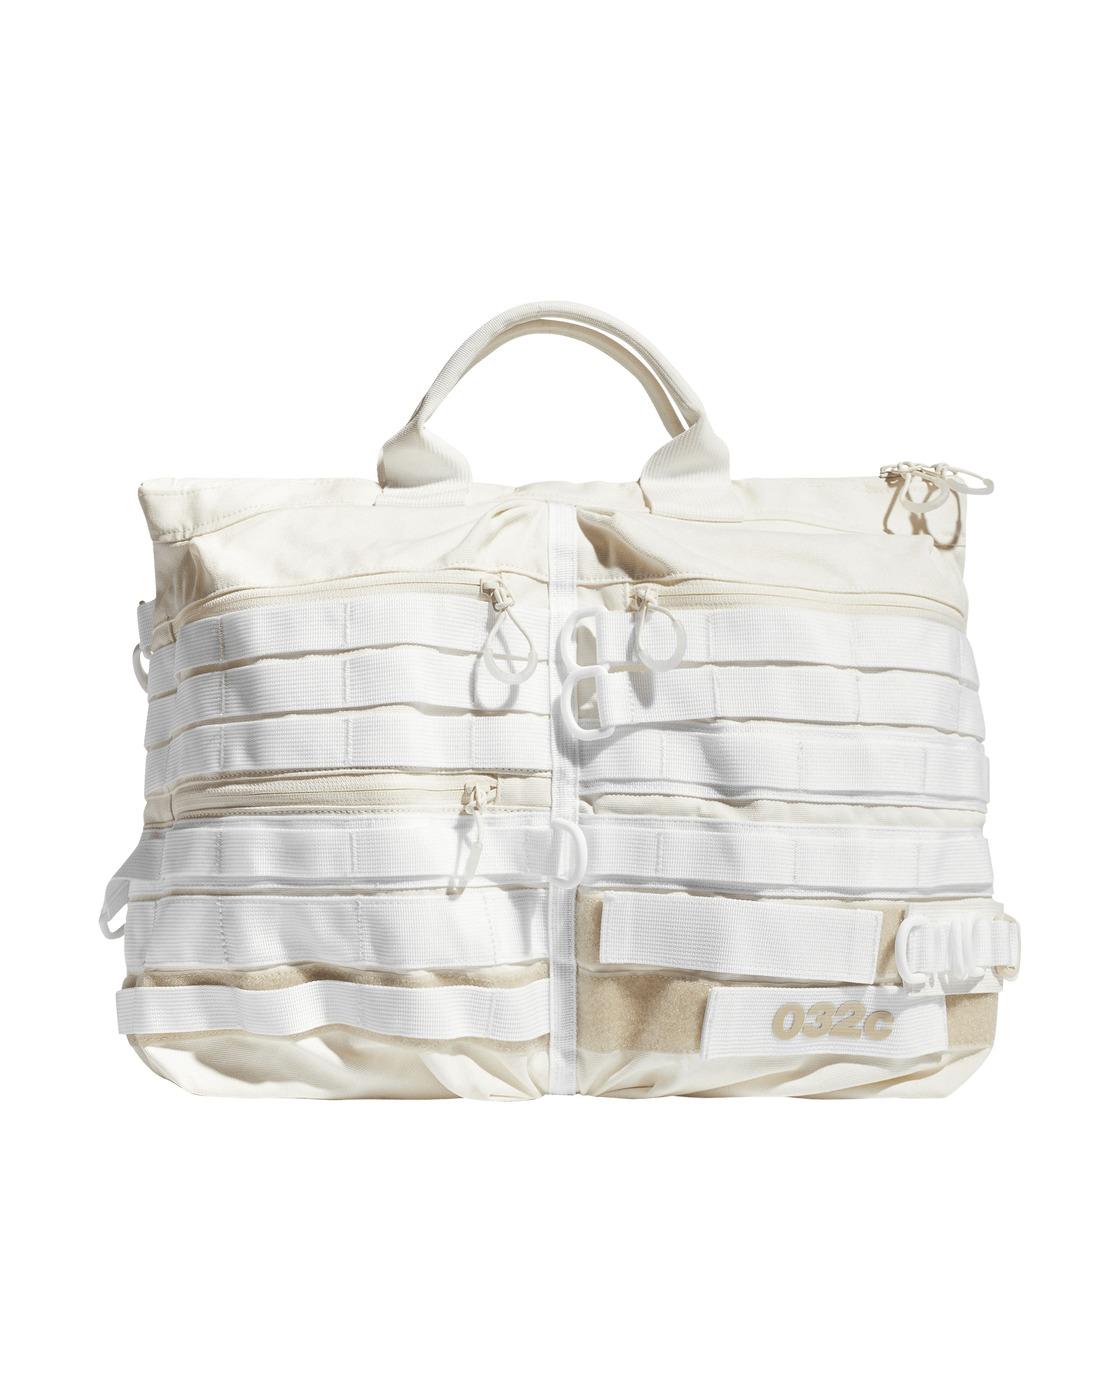 Photo: Adidas Originals 032c Duffel Bag Cotton White